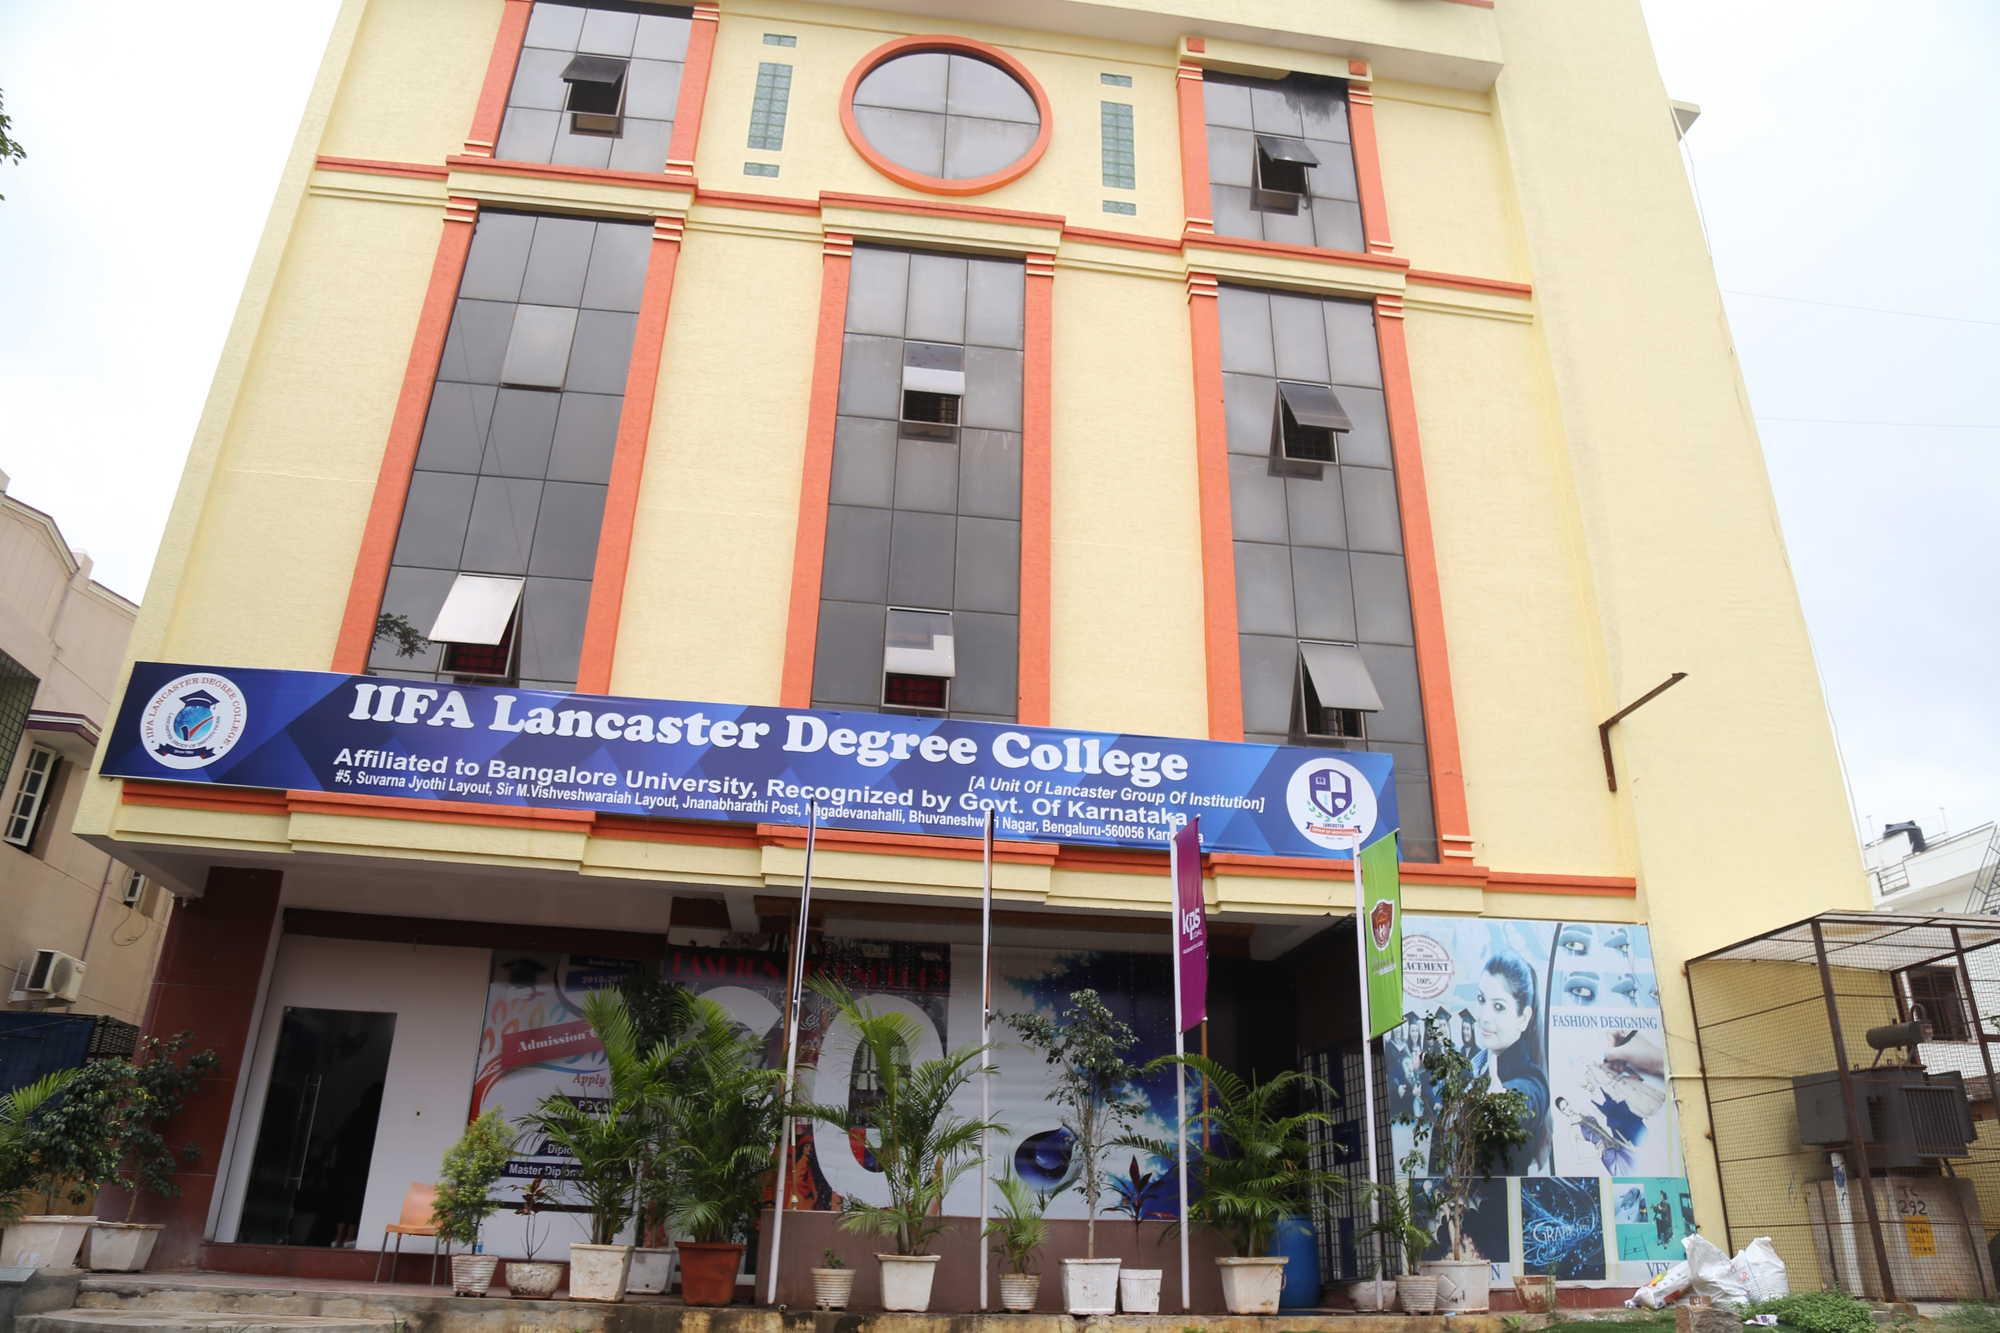 IIFA Lancaster Degree College, Bengaluru Image